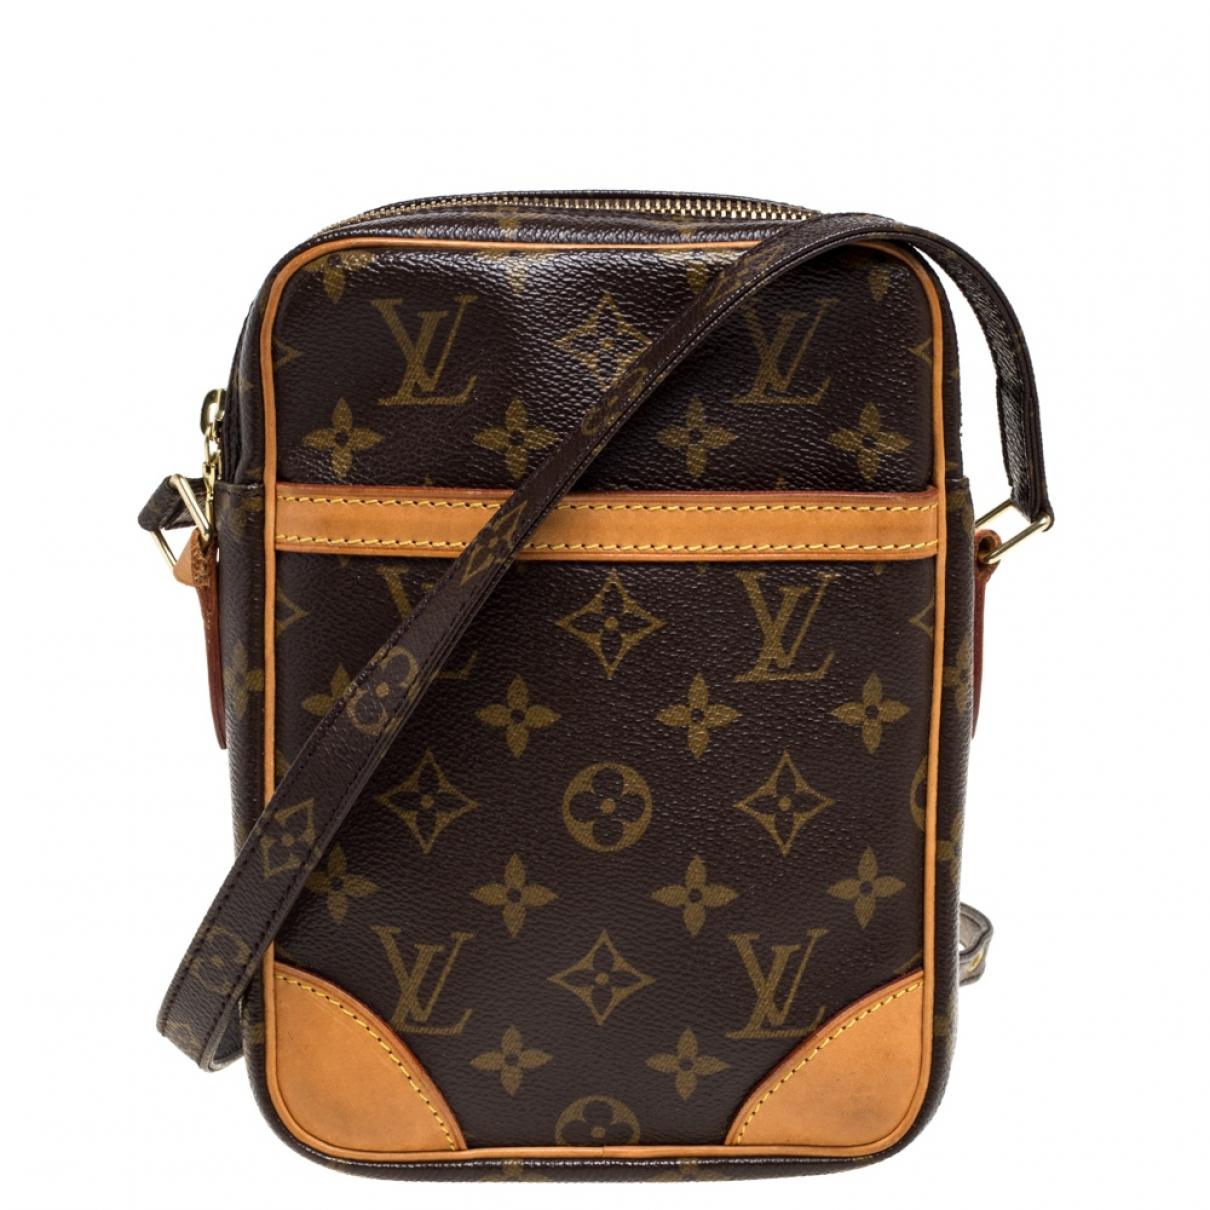 Louis Vuitton Danube Brown Leather handbag for Women N